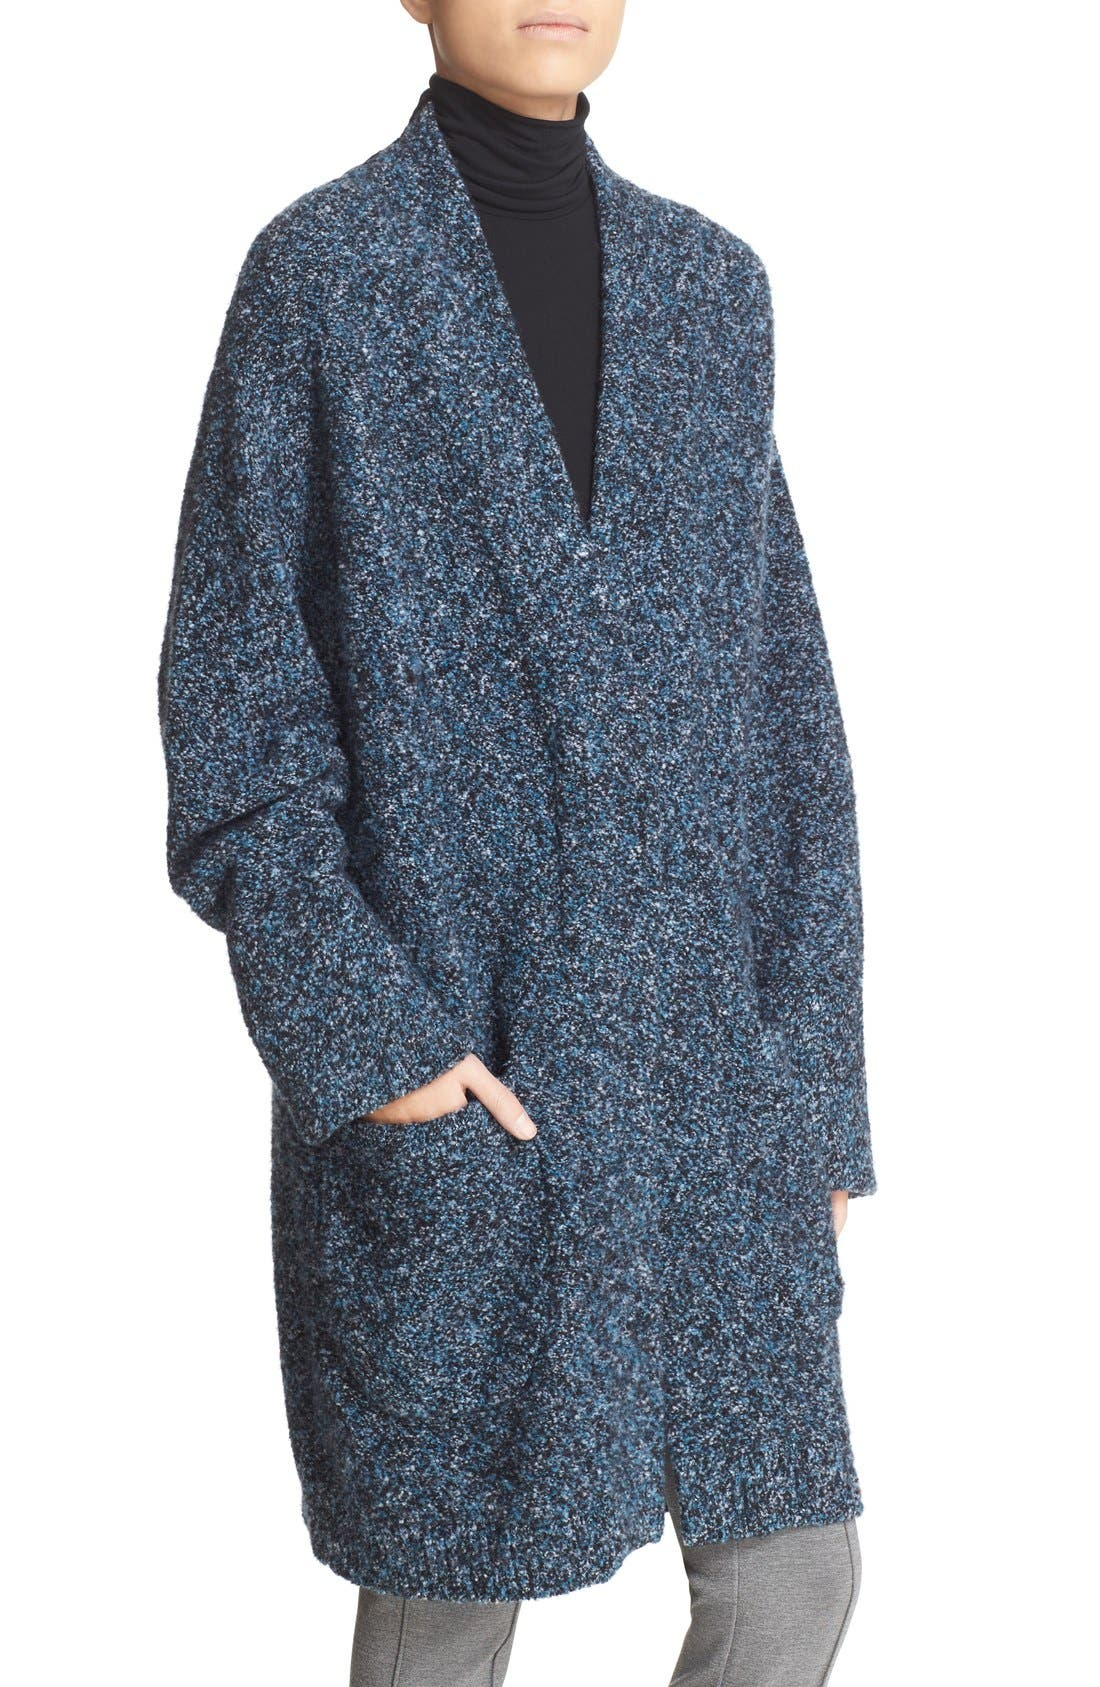 'Diana' Sweater Coat,                             Alternate thumbnail 4, color,                             474